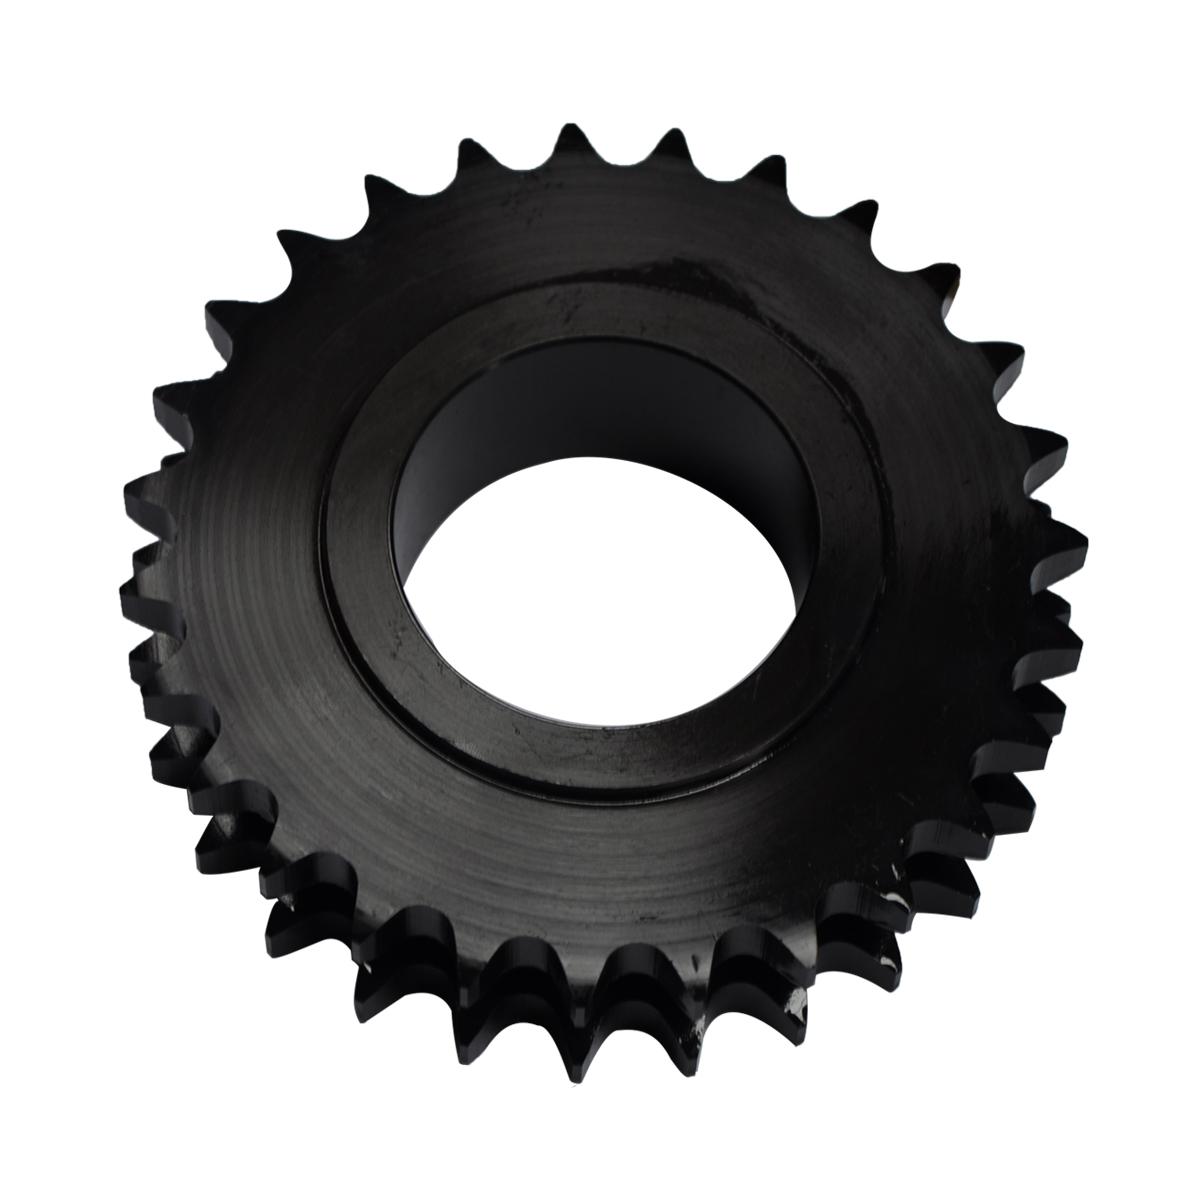 Sprocket wheel kits Hard teeth CT100 transmission Driven Stainless Steel double duplex conveyor roller chain Sprockets